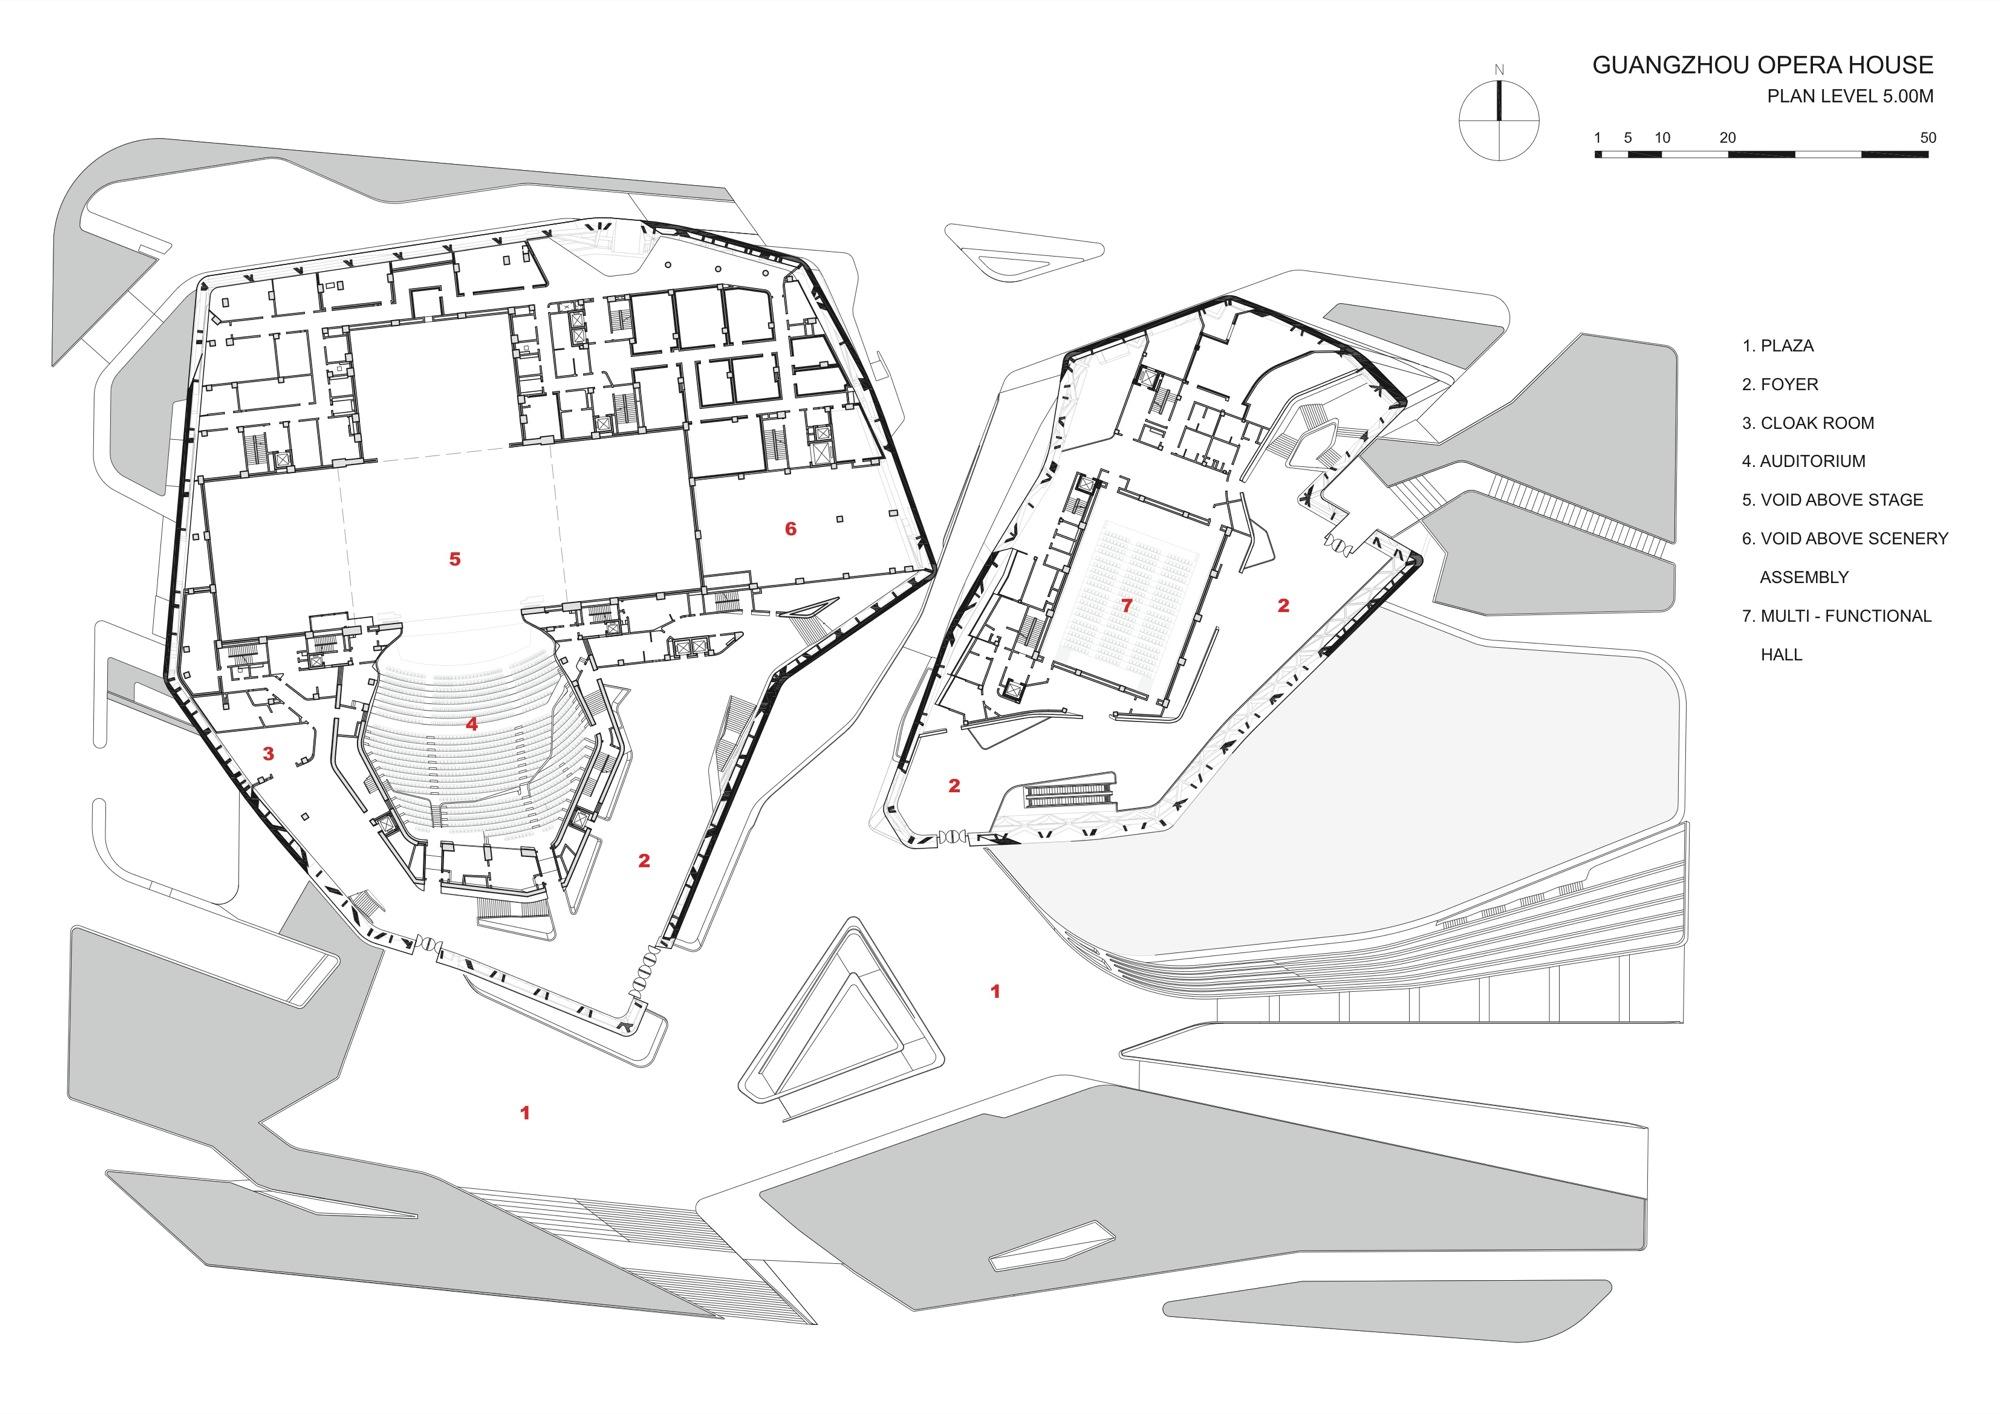 Manchester opera house layout